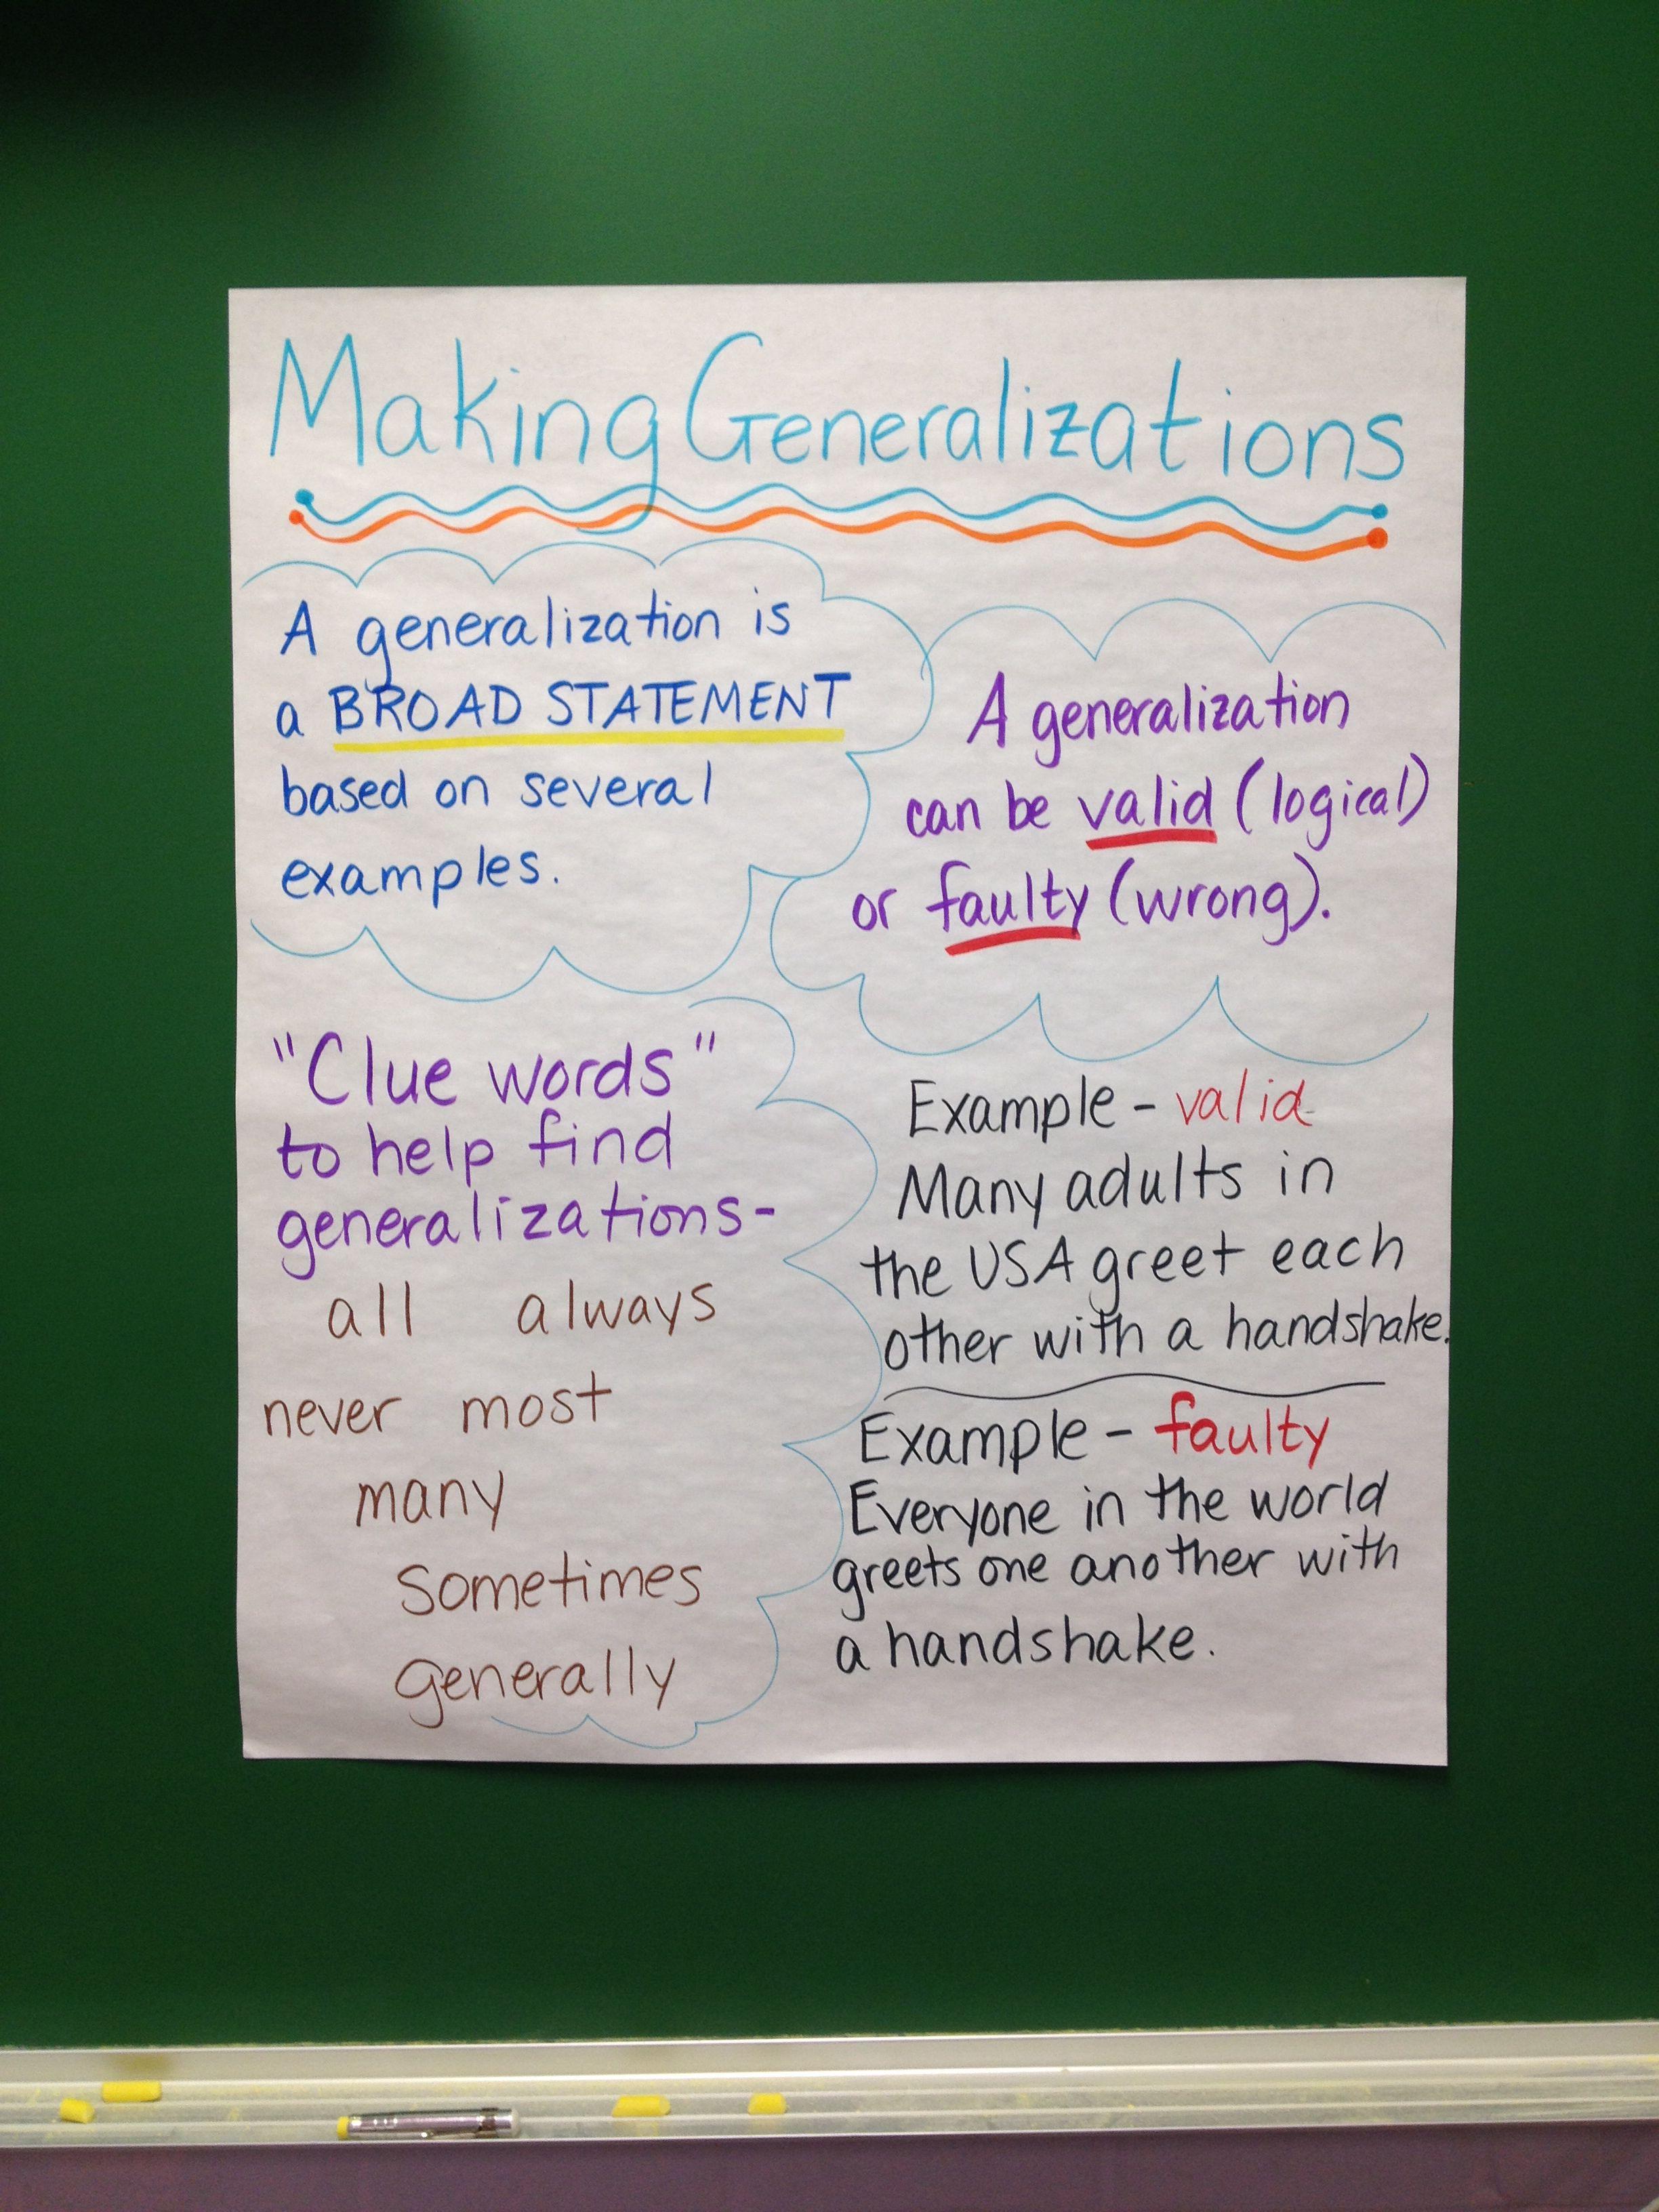 Worksheets Making Generalizations Worksheets making generalizations comprehension pinterest anchor charts readers workshop generalizations